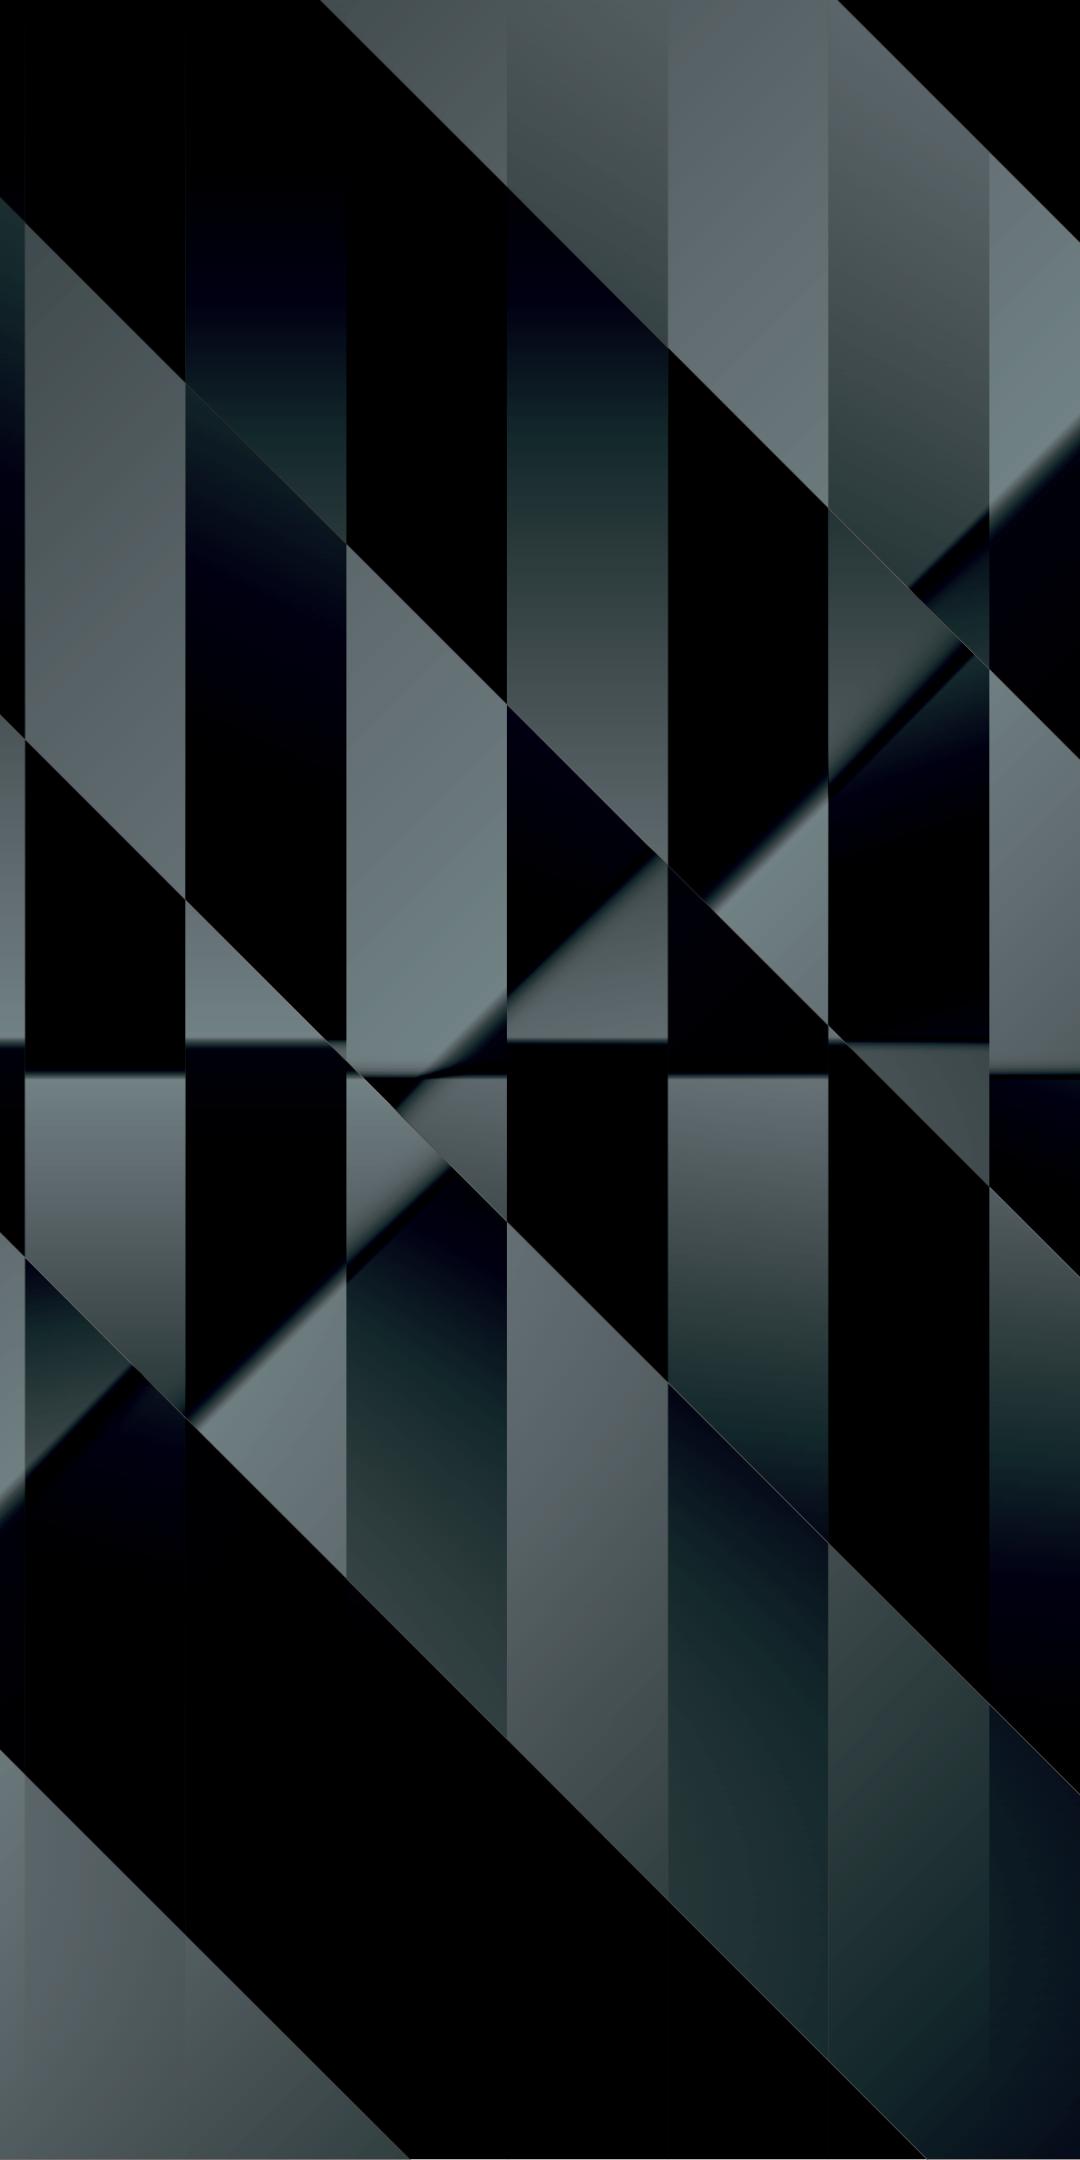 Wallpaper 918387